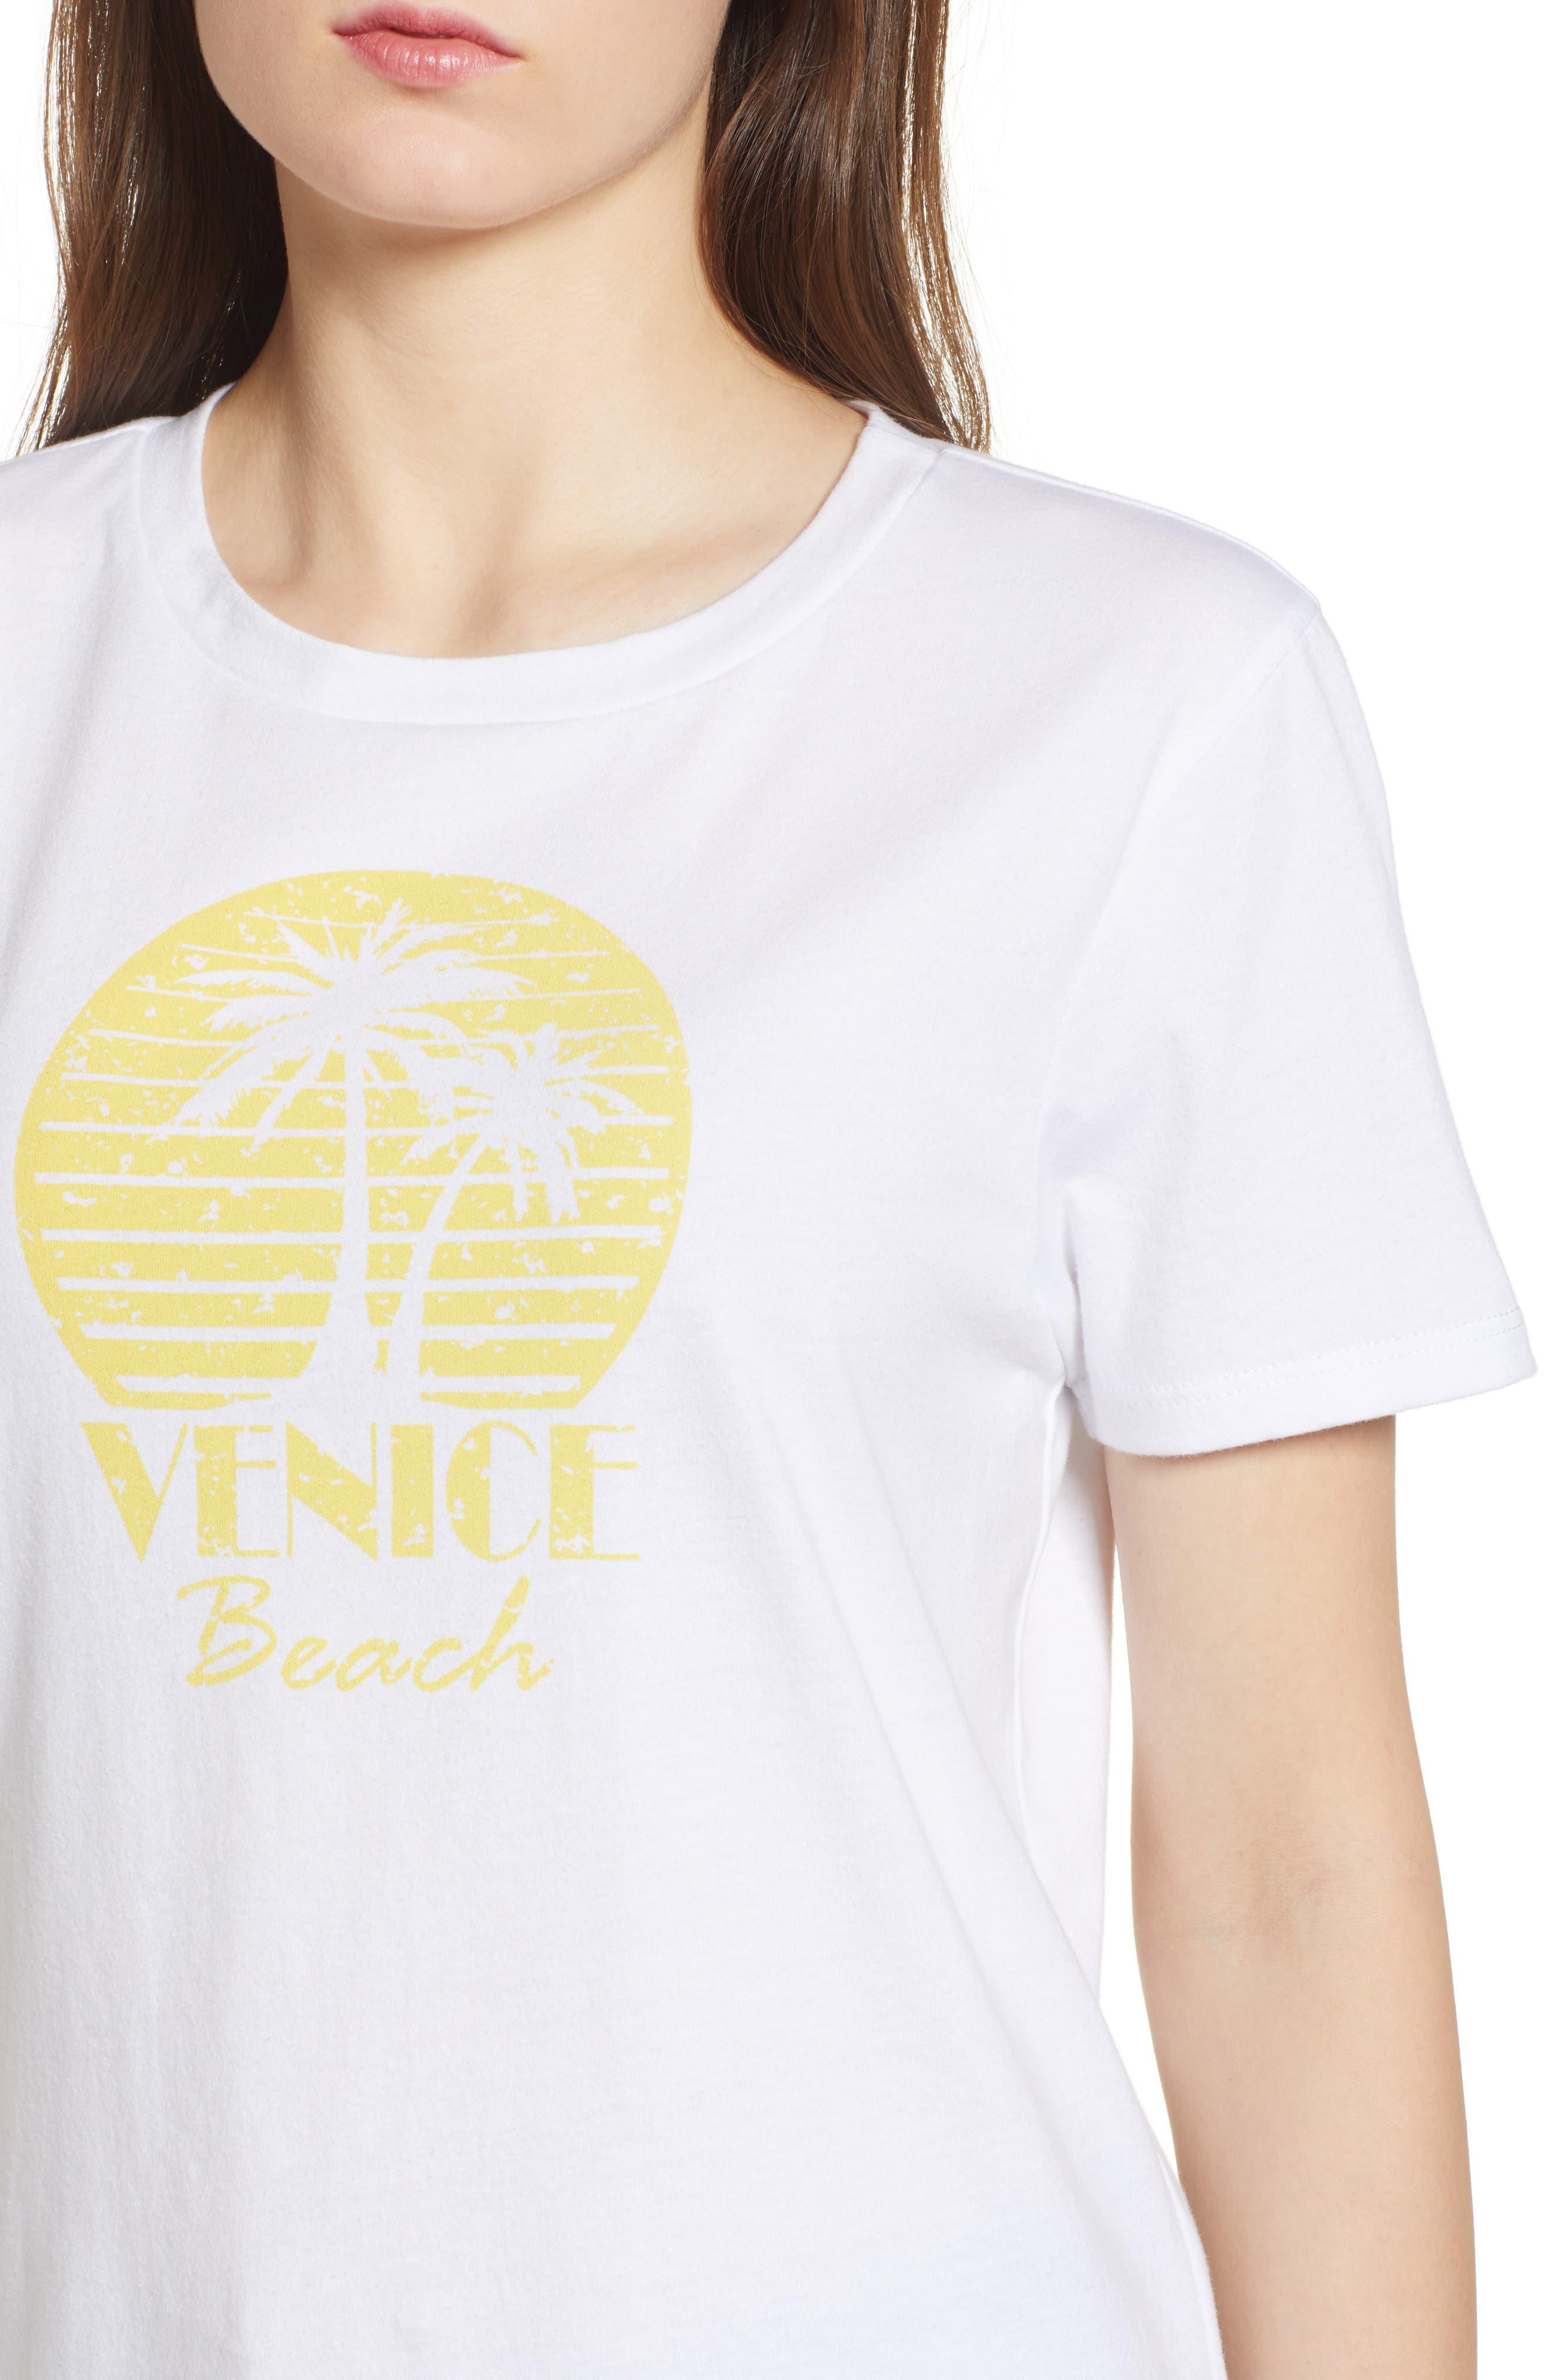 Venice Beach Graphic Tee,                             Alternate thumbnail 4, color,                             White